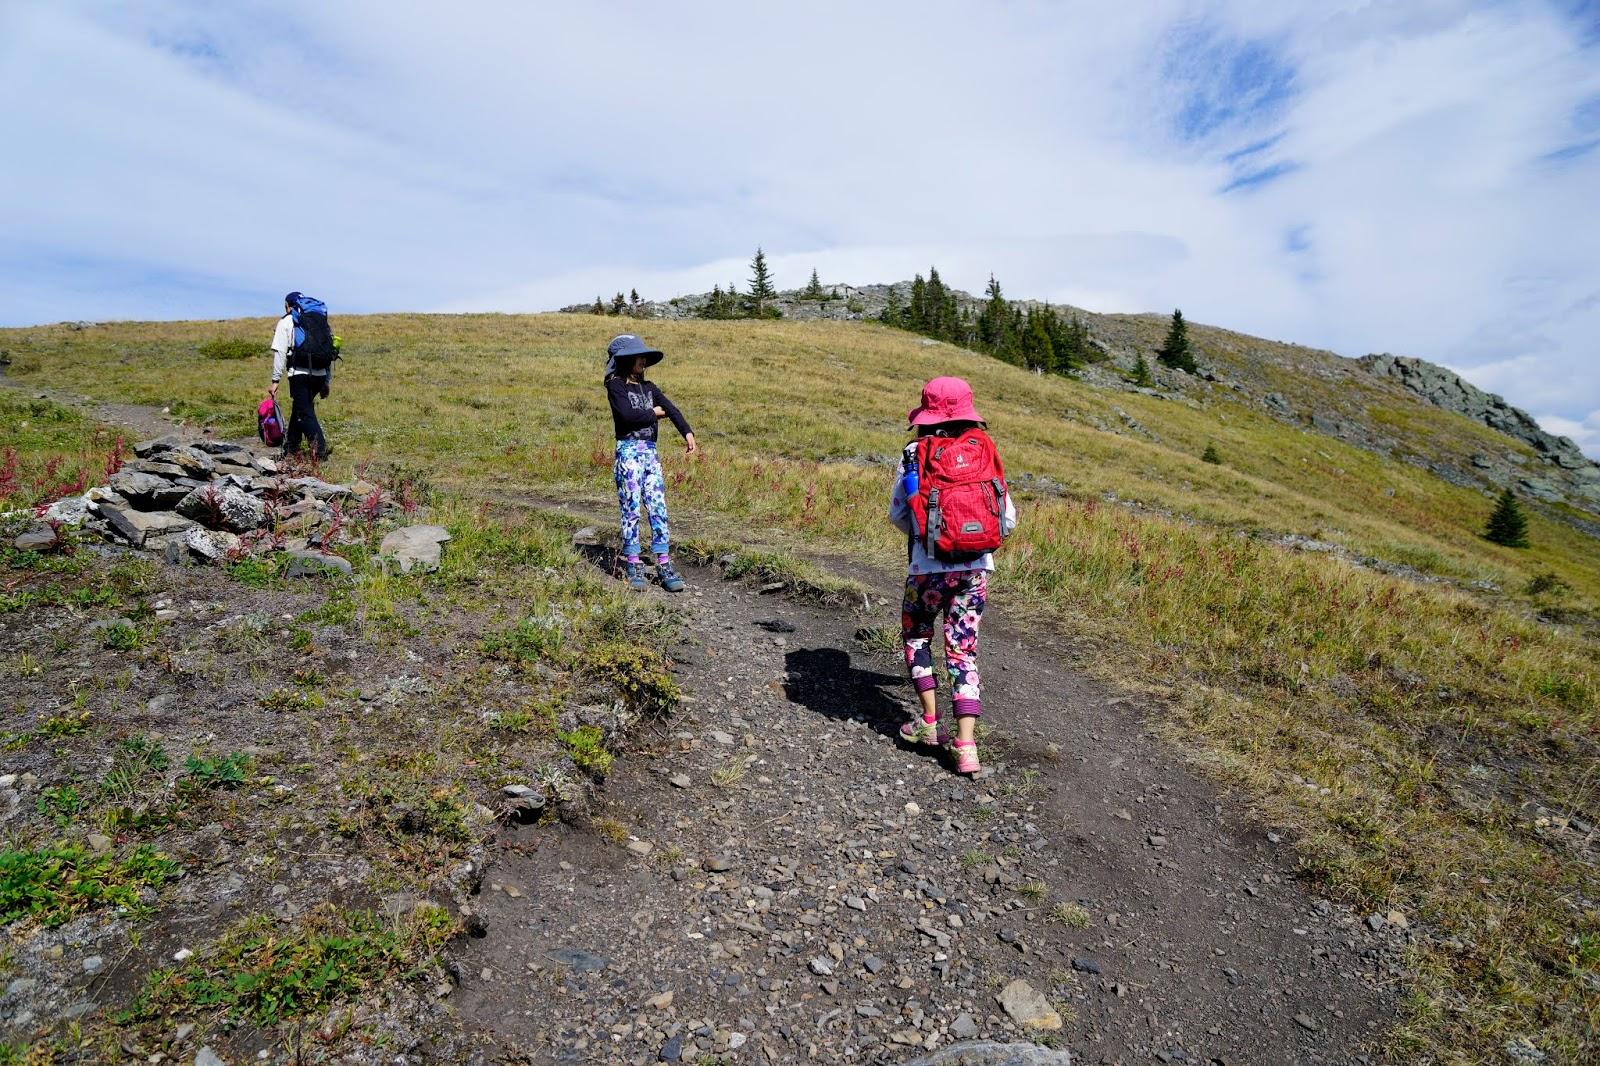 Heading up onto the ridge, Jumpingpound Summit